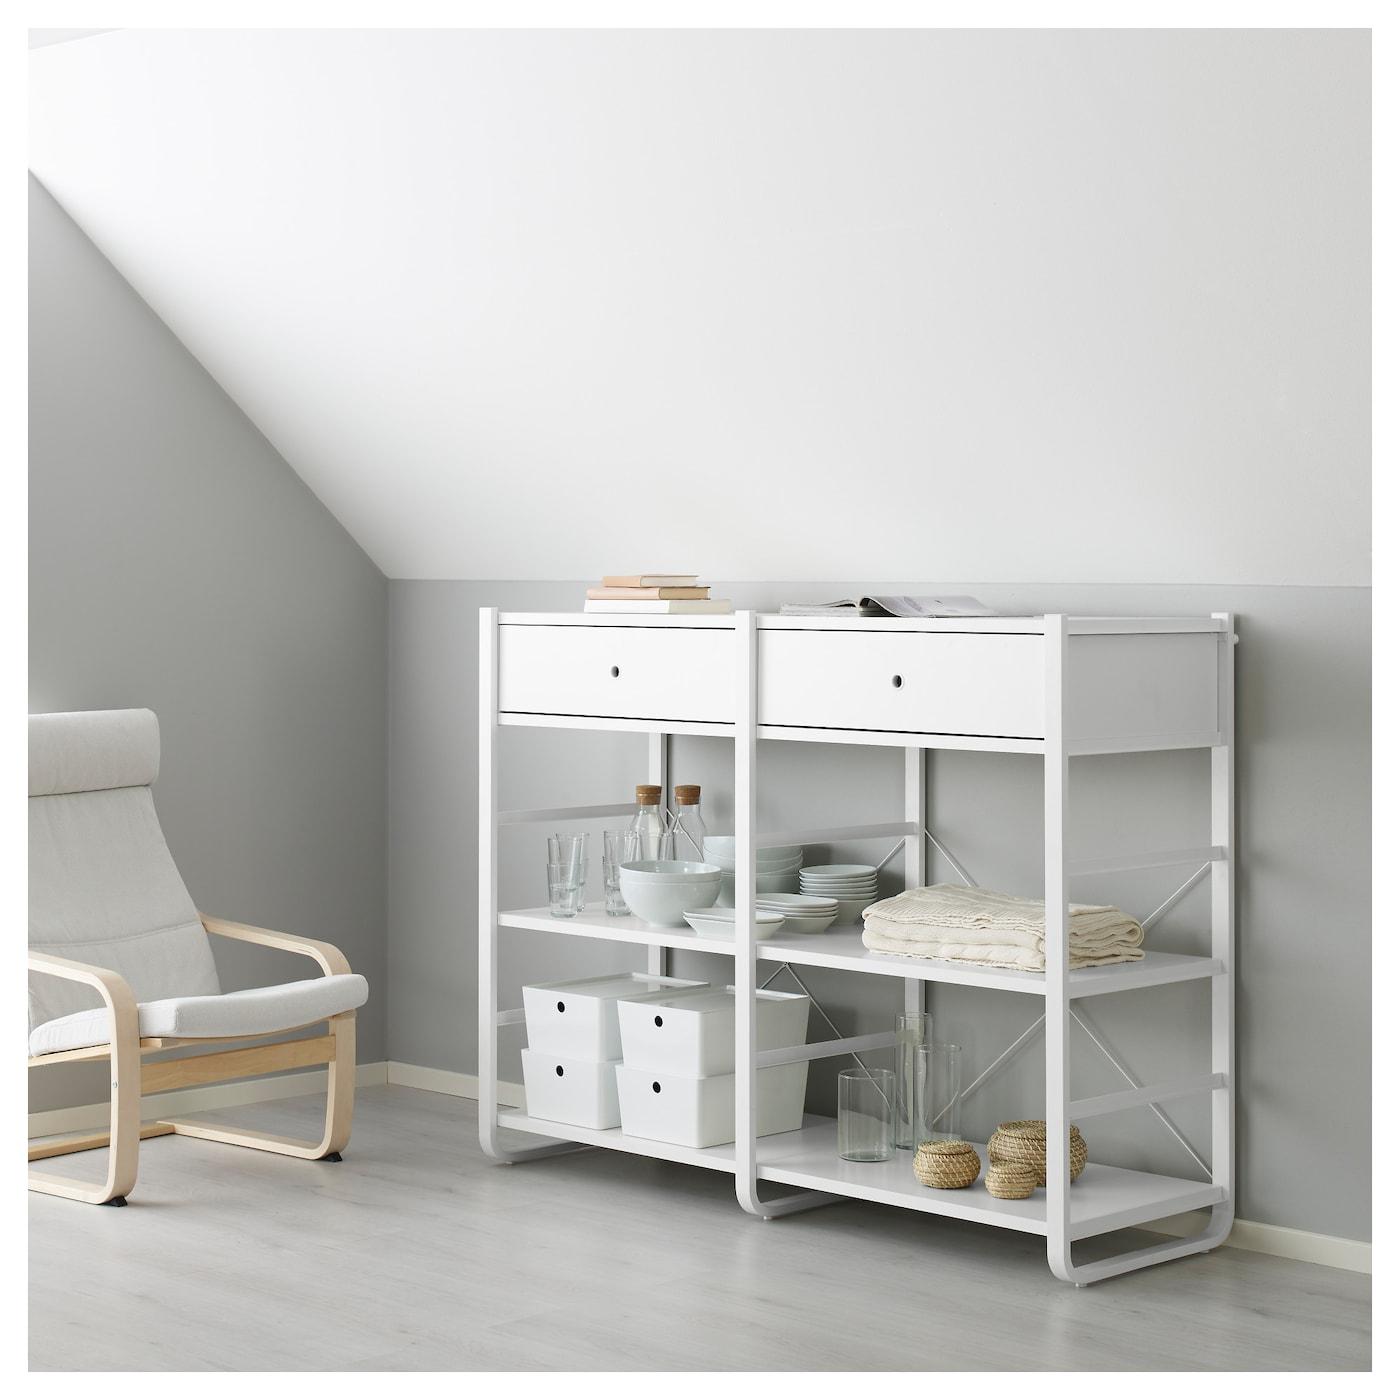 elvarli 2 sections white 165 x 55 x 126 cm ikea. Black Bedroom Furniture Sets. Home Design Ideas